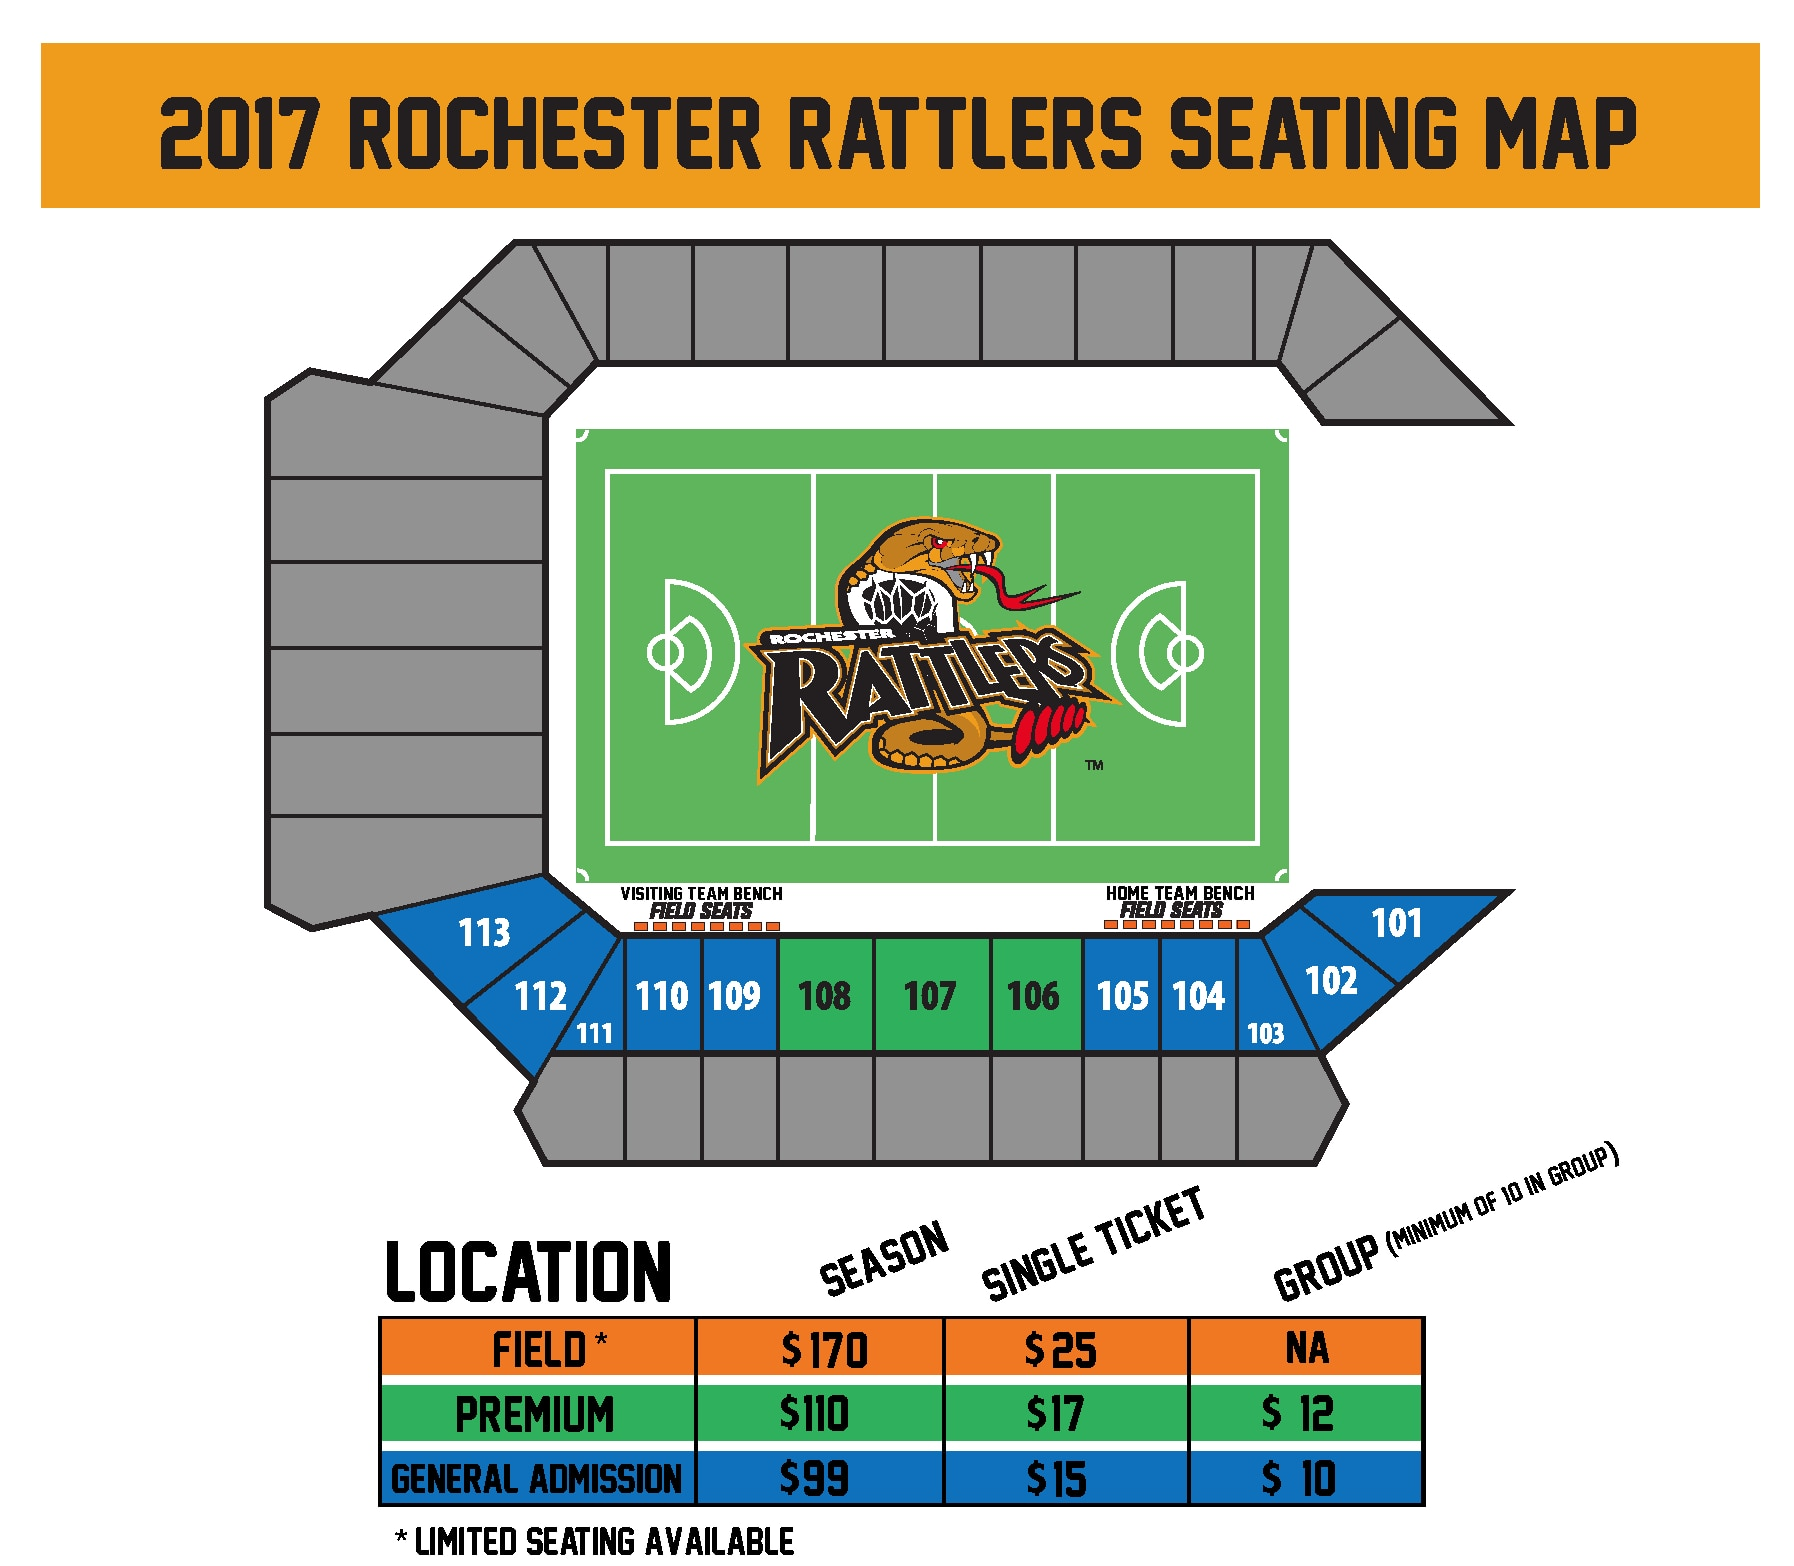 Rochester Rattlers Seating Chart - Capelli Sport Stadium